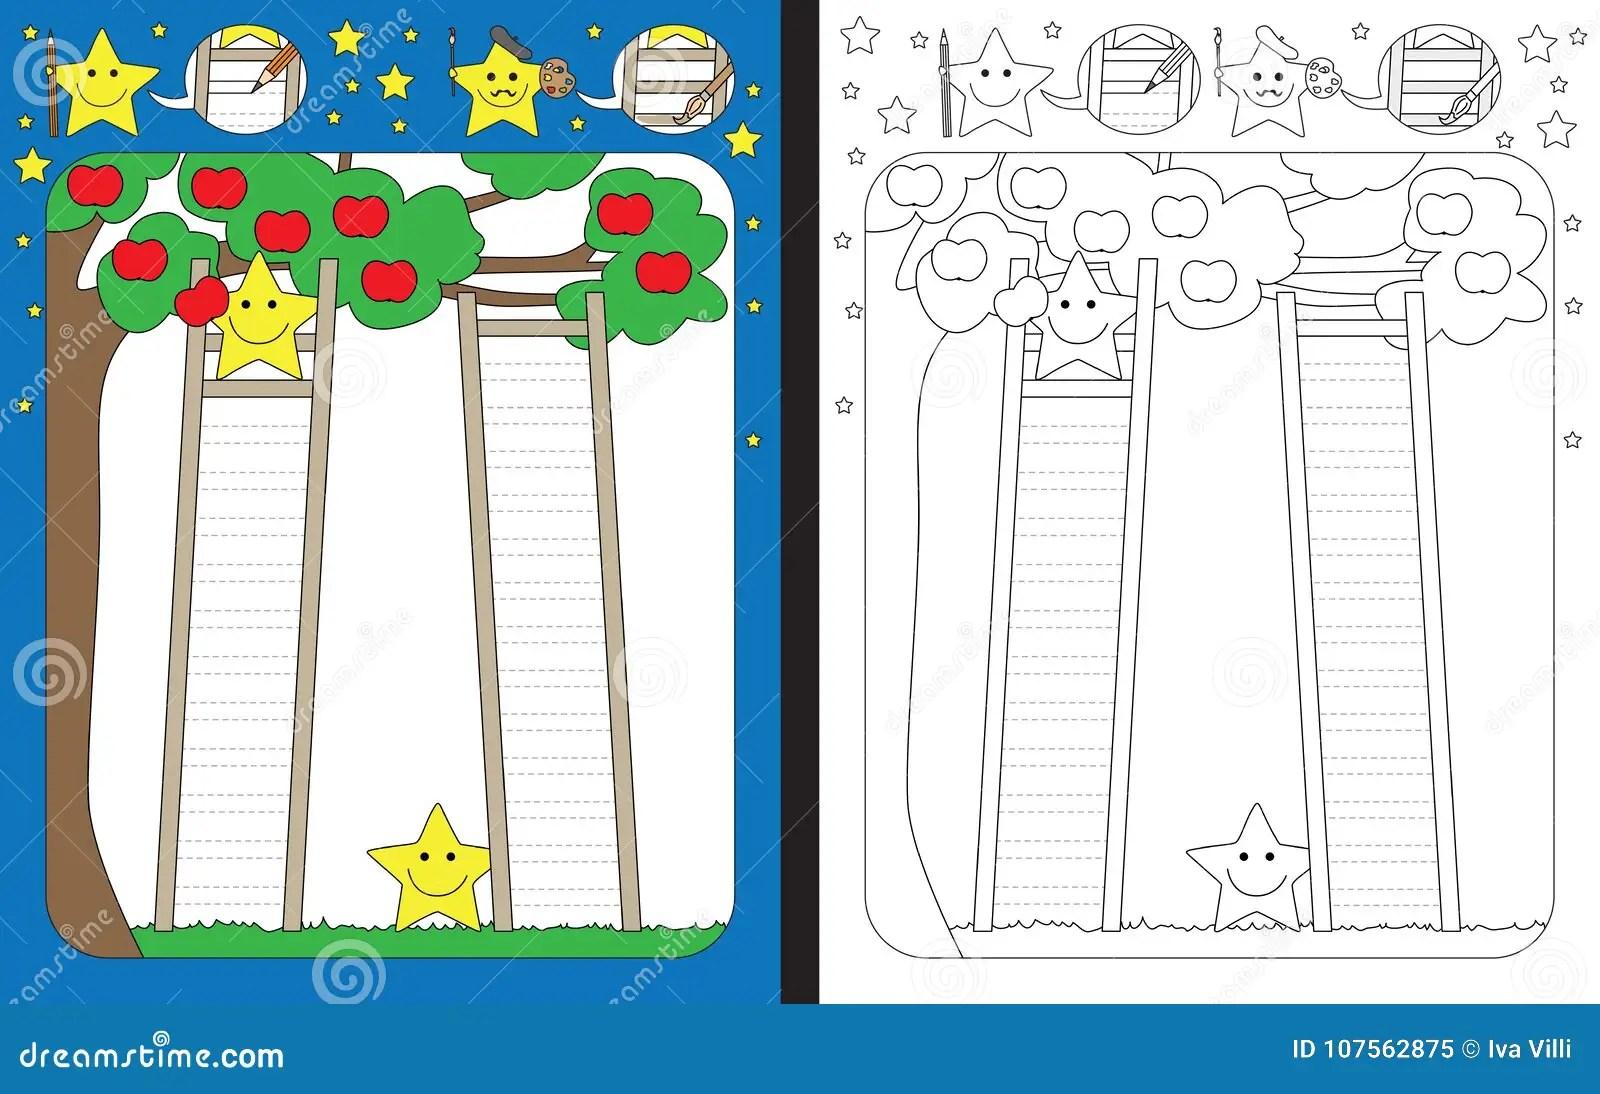 Preschool Worksheet Stock Vector Illustration Of Ladder